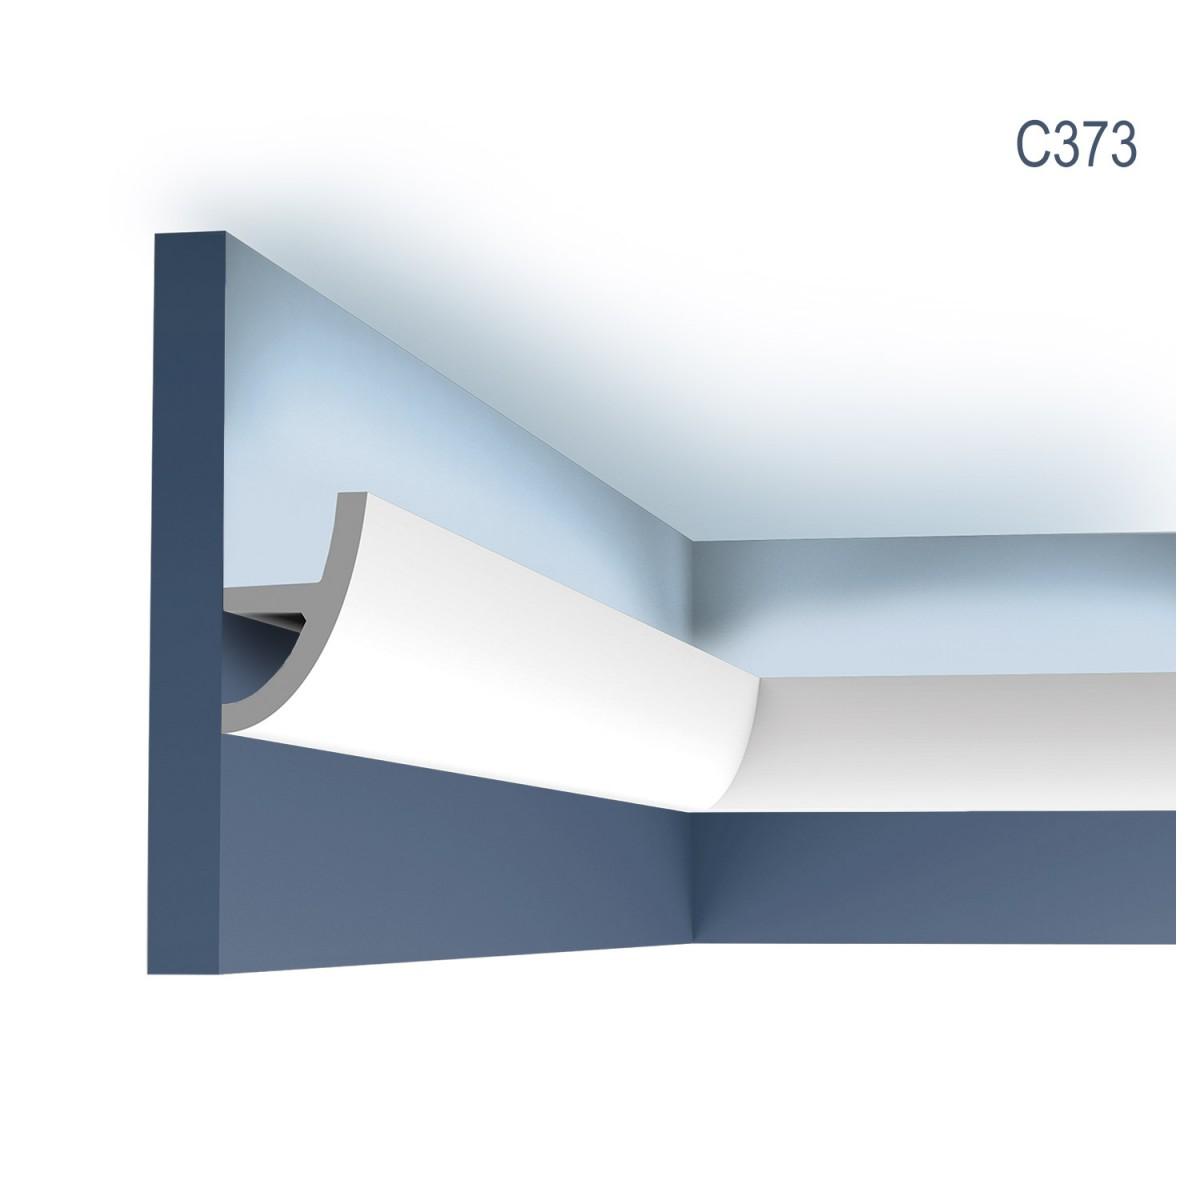 Cornisa Ulf Moritz C373, Dimensiuni: 200 X 8 X 5 cm, Orac Decor